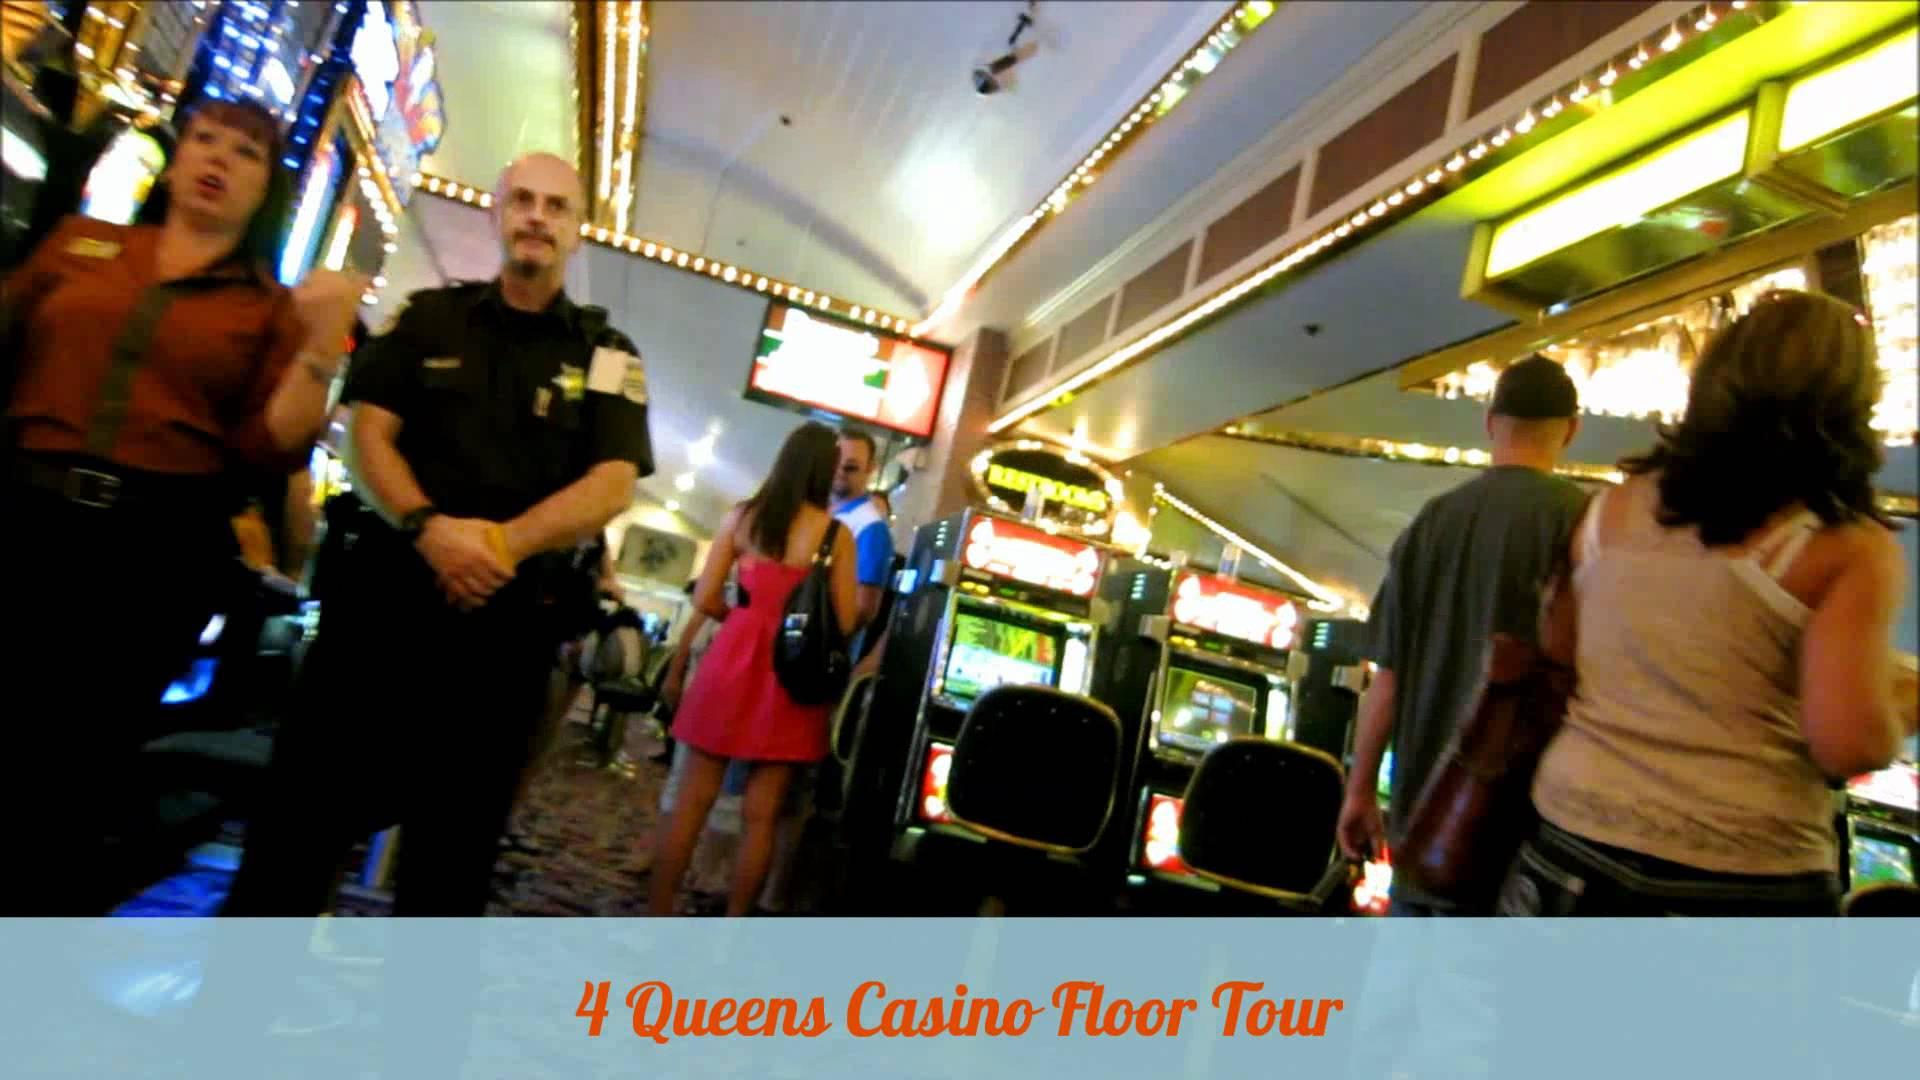 online casino games to play for free casinos in deutschland